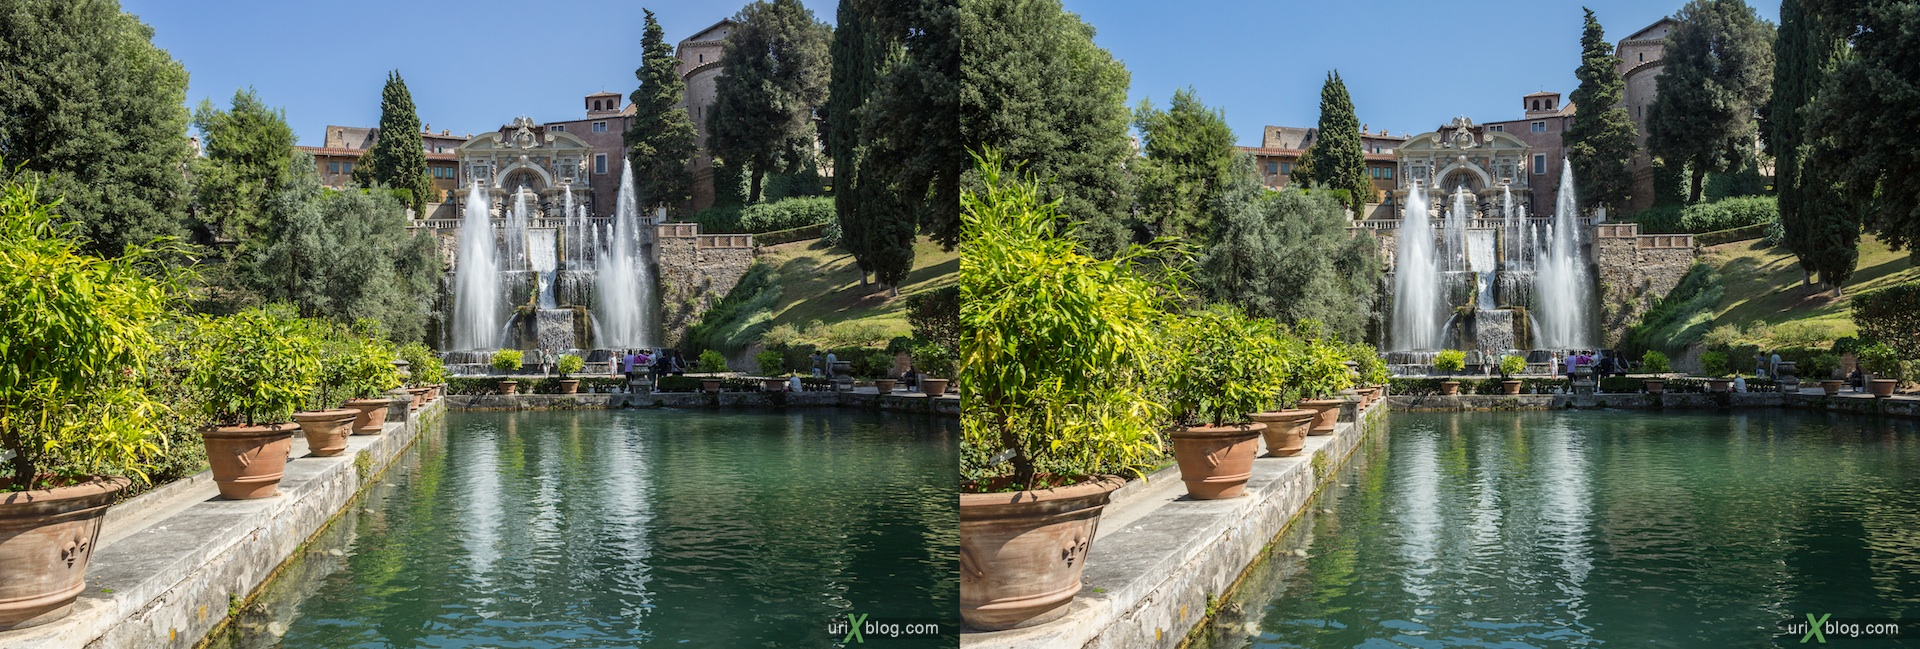 2012, Fountain of Neptune, villa D'Este, Italy, Tivoli, Rome, 3D, stereo pair, cross-eyed, crossview, cross view stereo pair